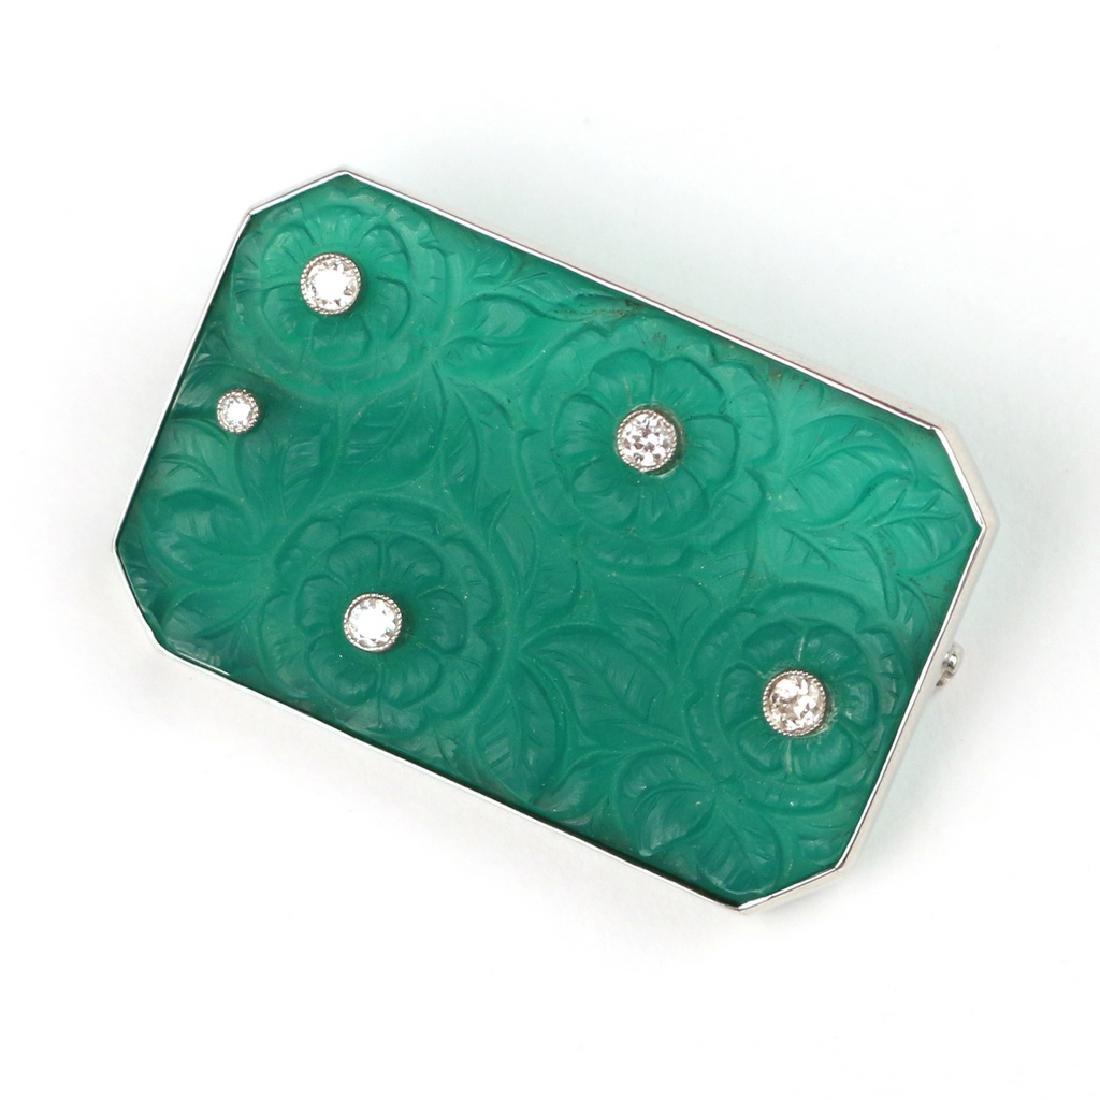 PLIQUE-A-JOUR & DIAMOND PIN